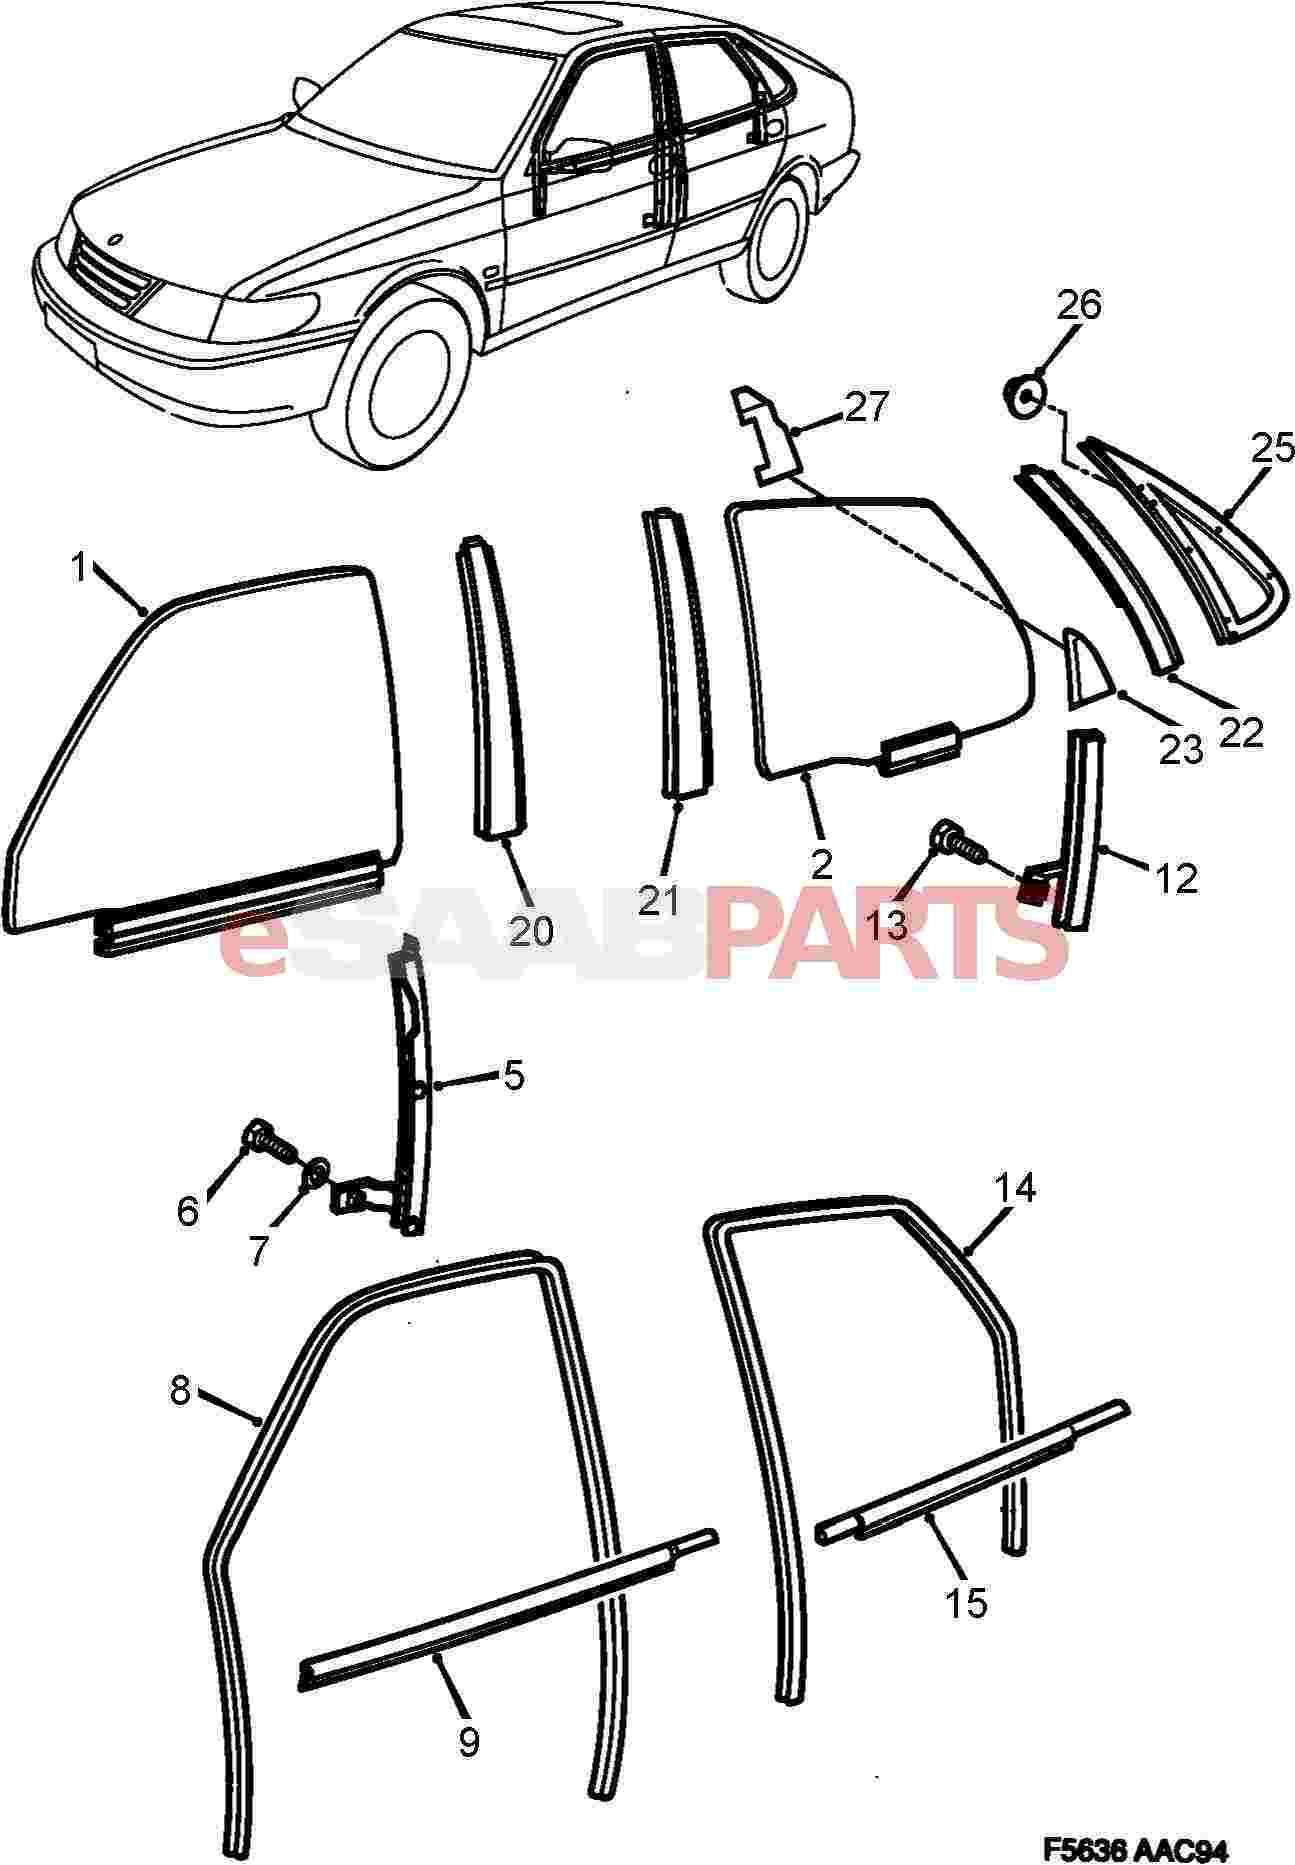 saab 900 chassis diagram